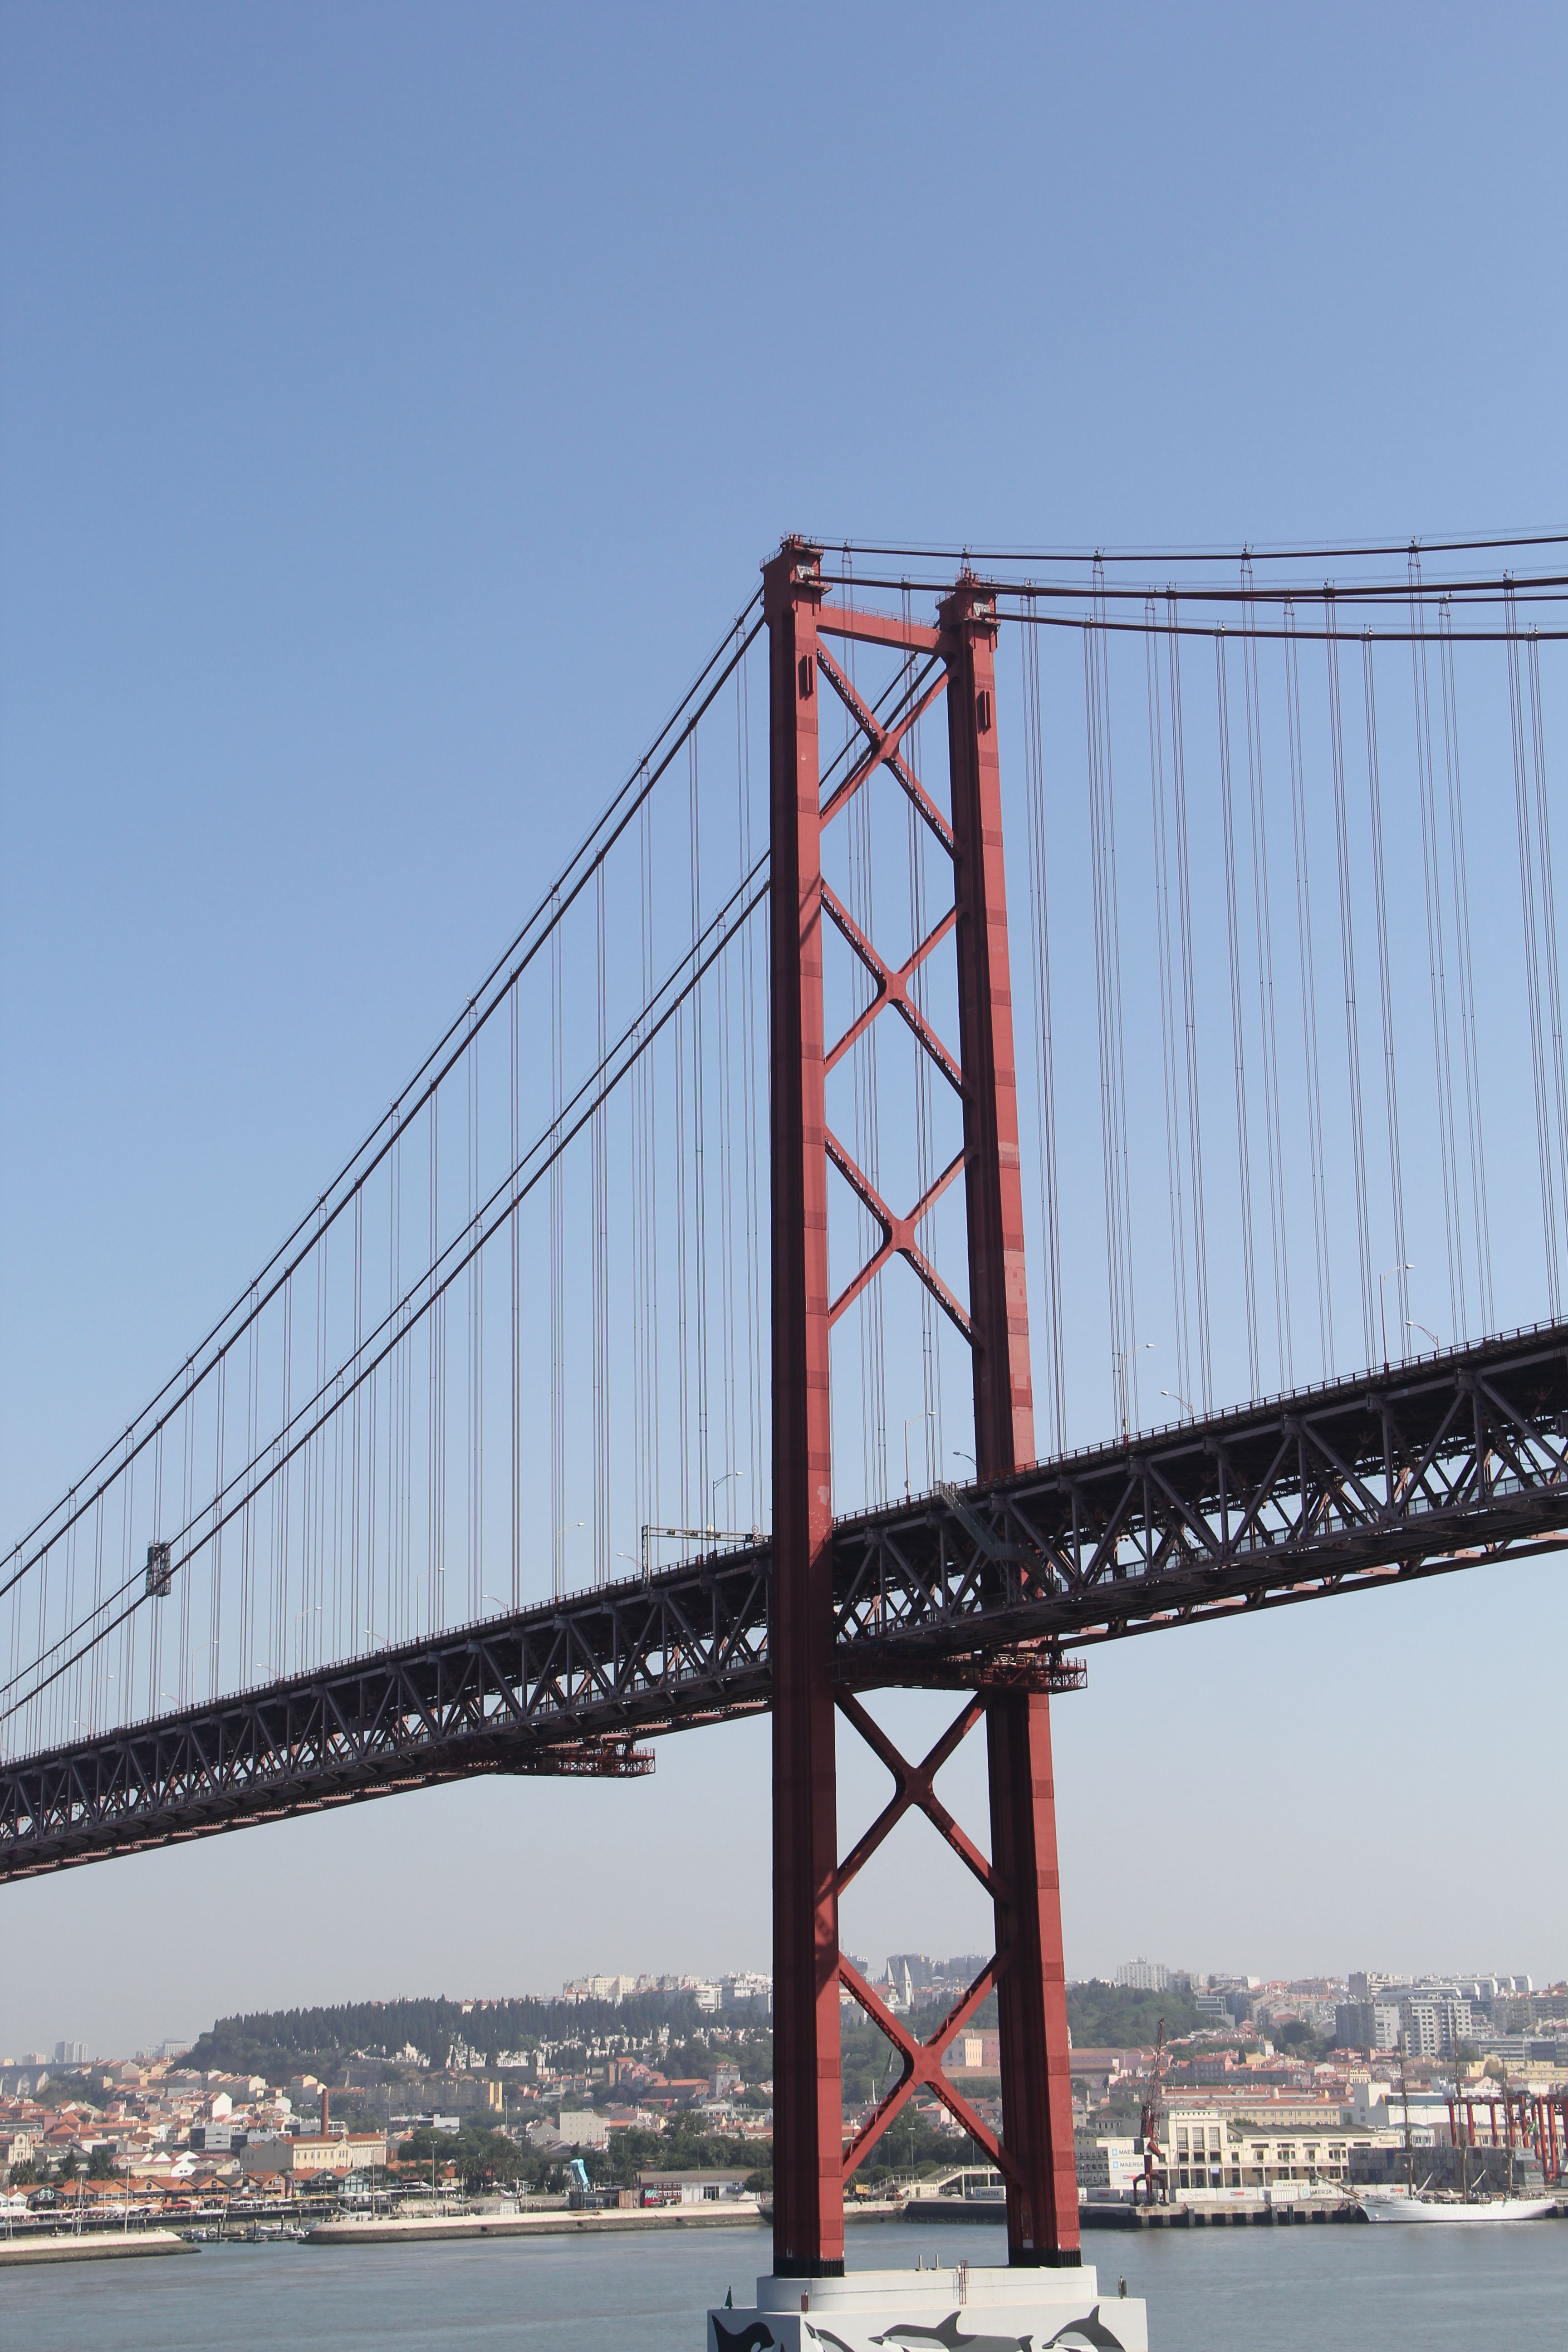 25 De Abril Bridge In Lisbon Portugal Was Inspired By 2 Us Bridges It S Orange Color Is Just Like The Golden Gate Bridge Bay Bridge Golden Gate Bridge Lisbon